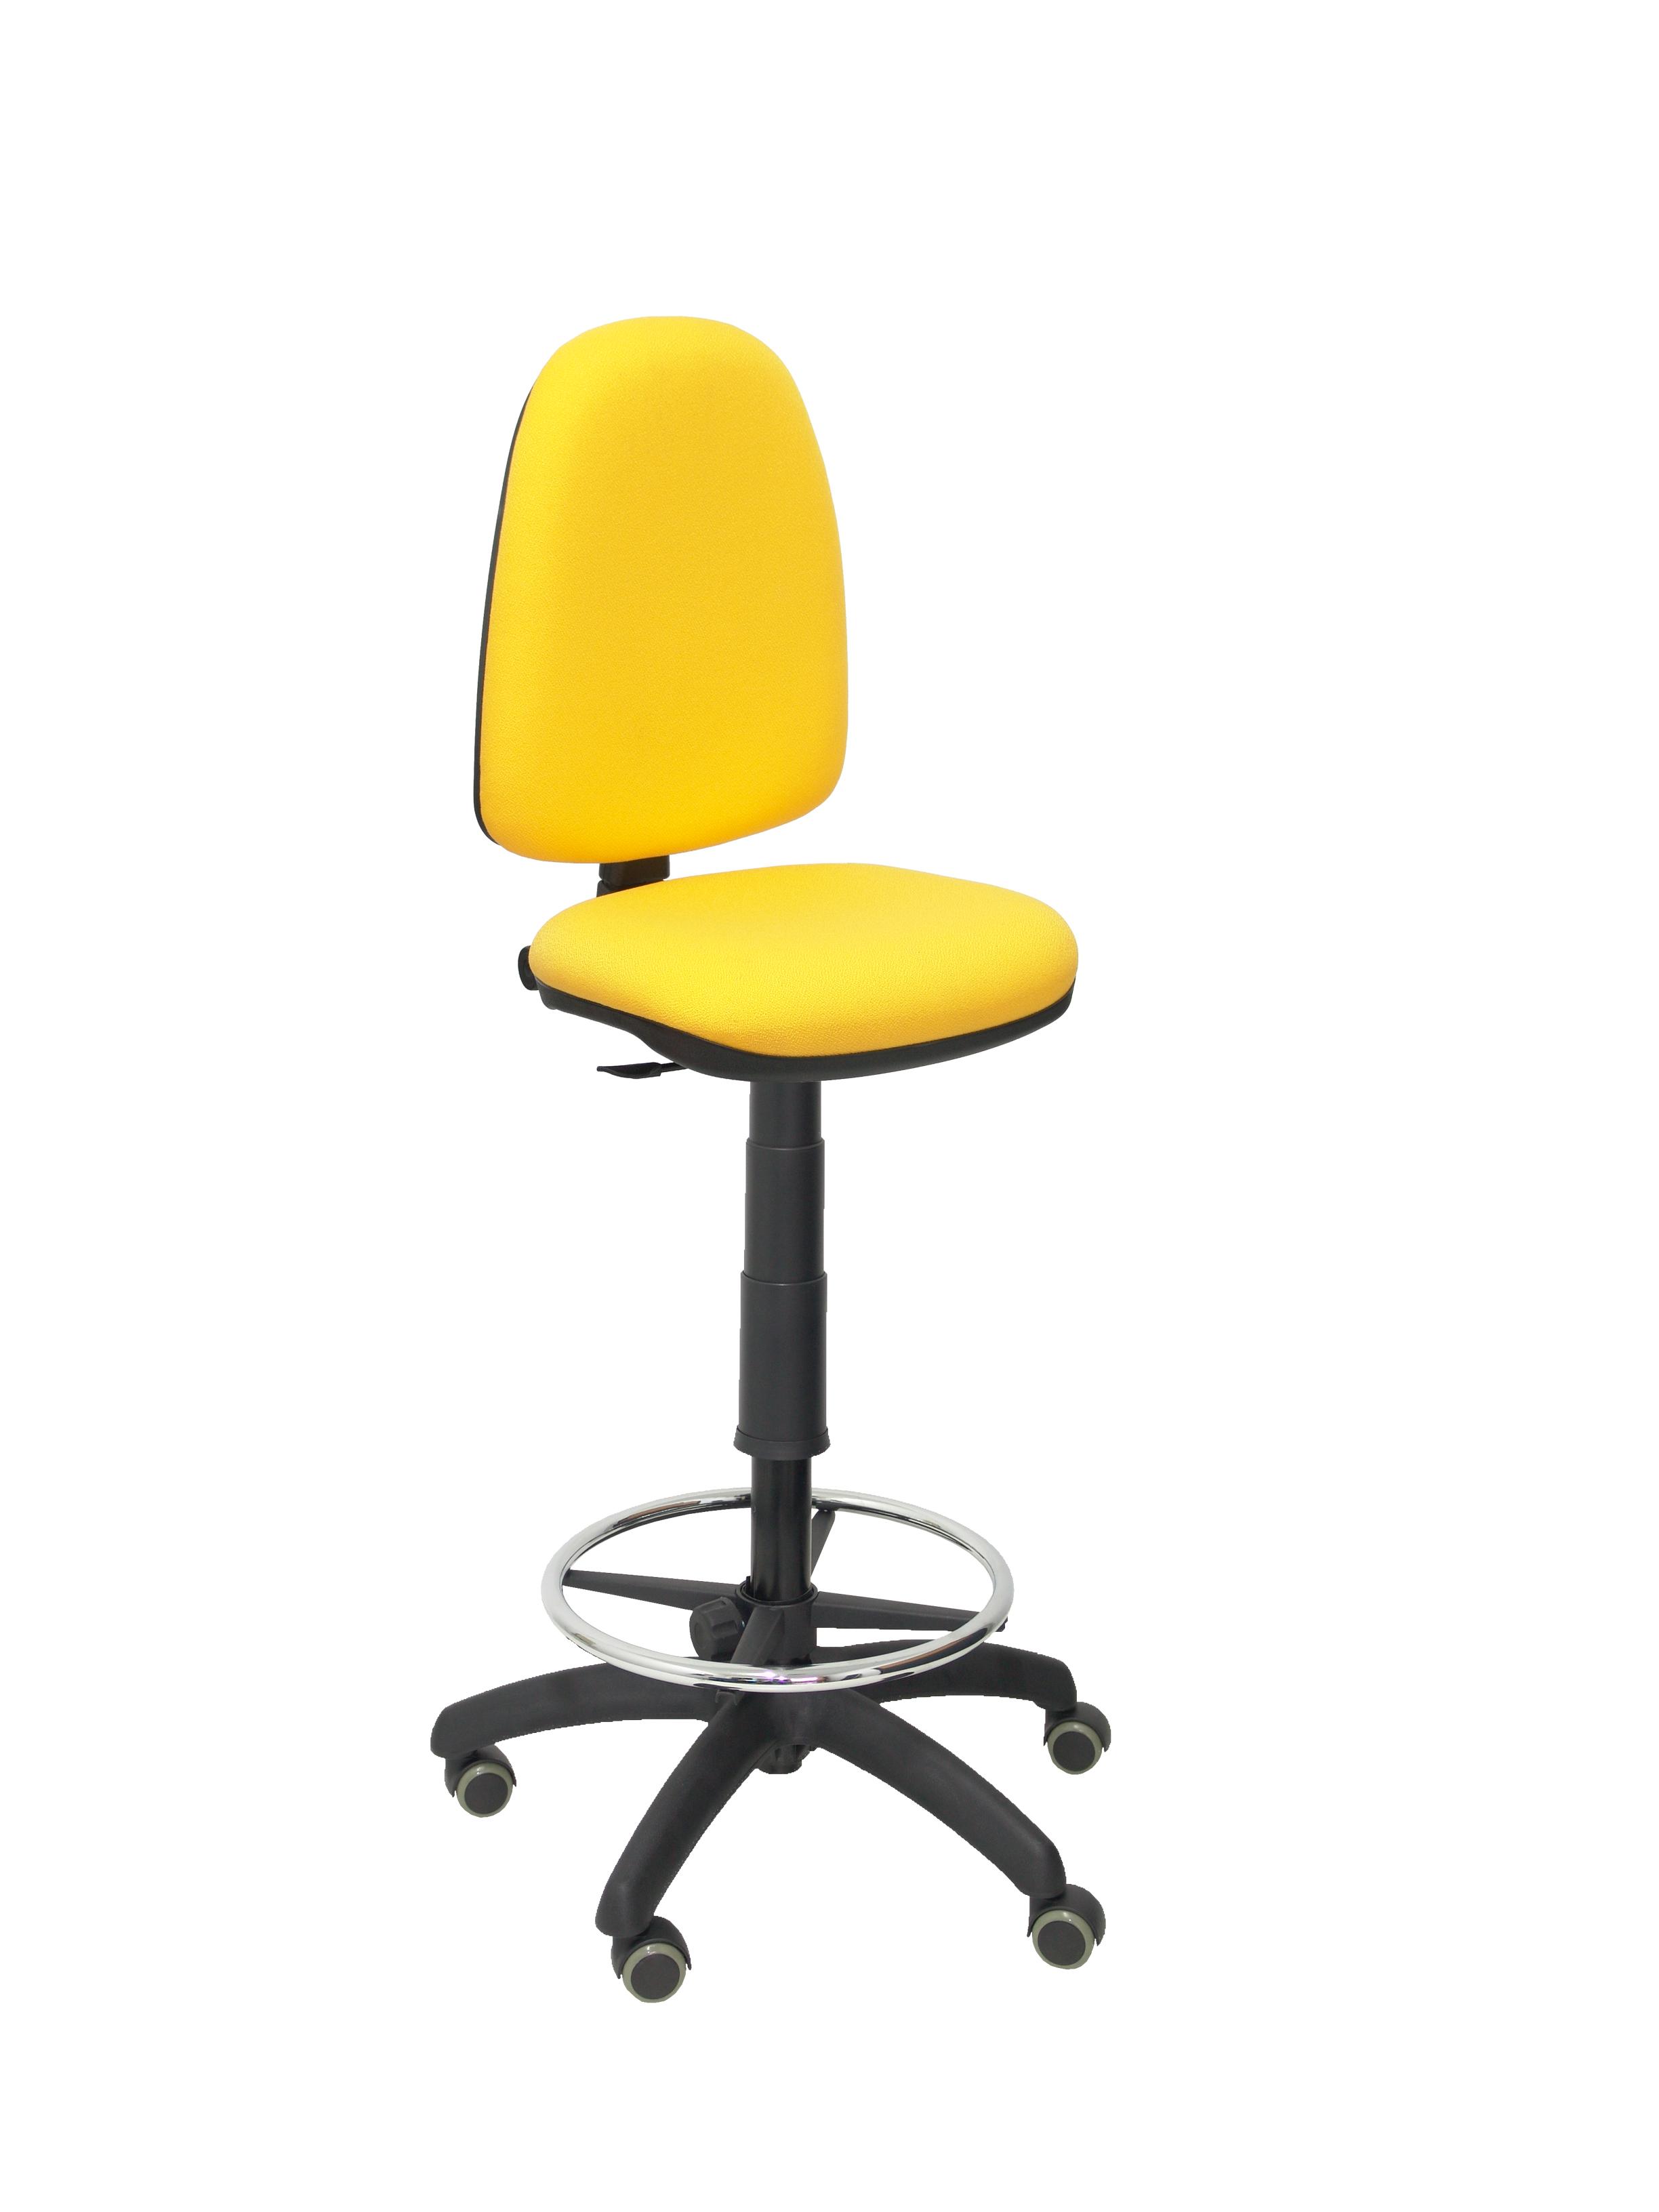 Taburete Ayna bali amarillo ruedas de parquet